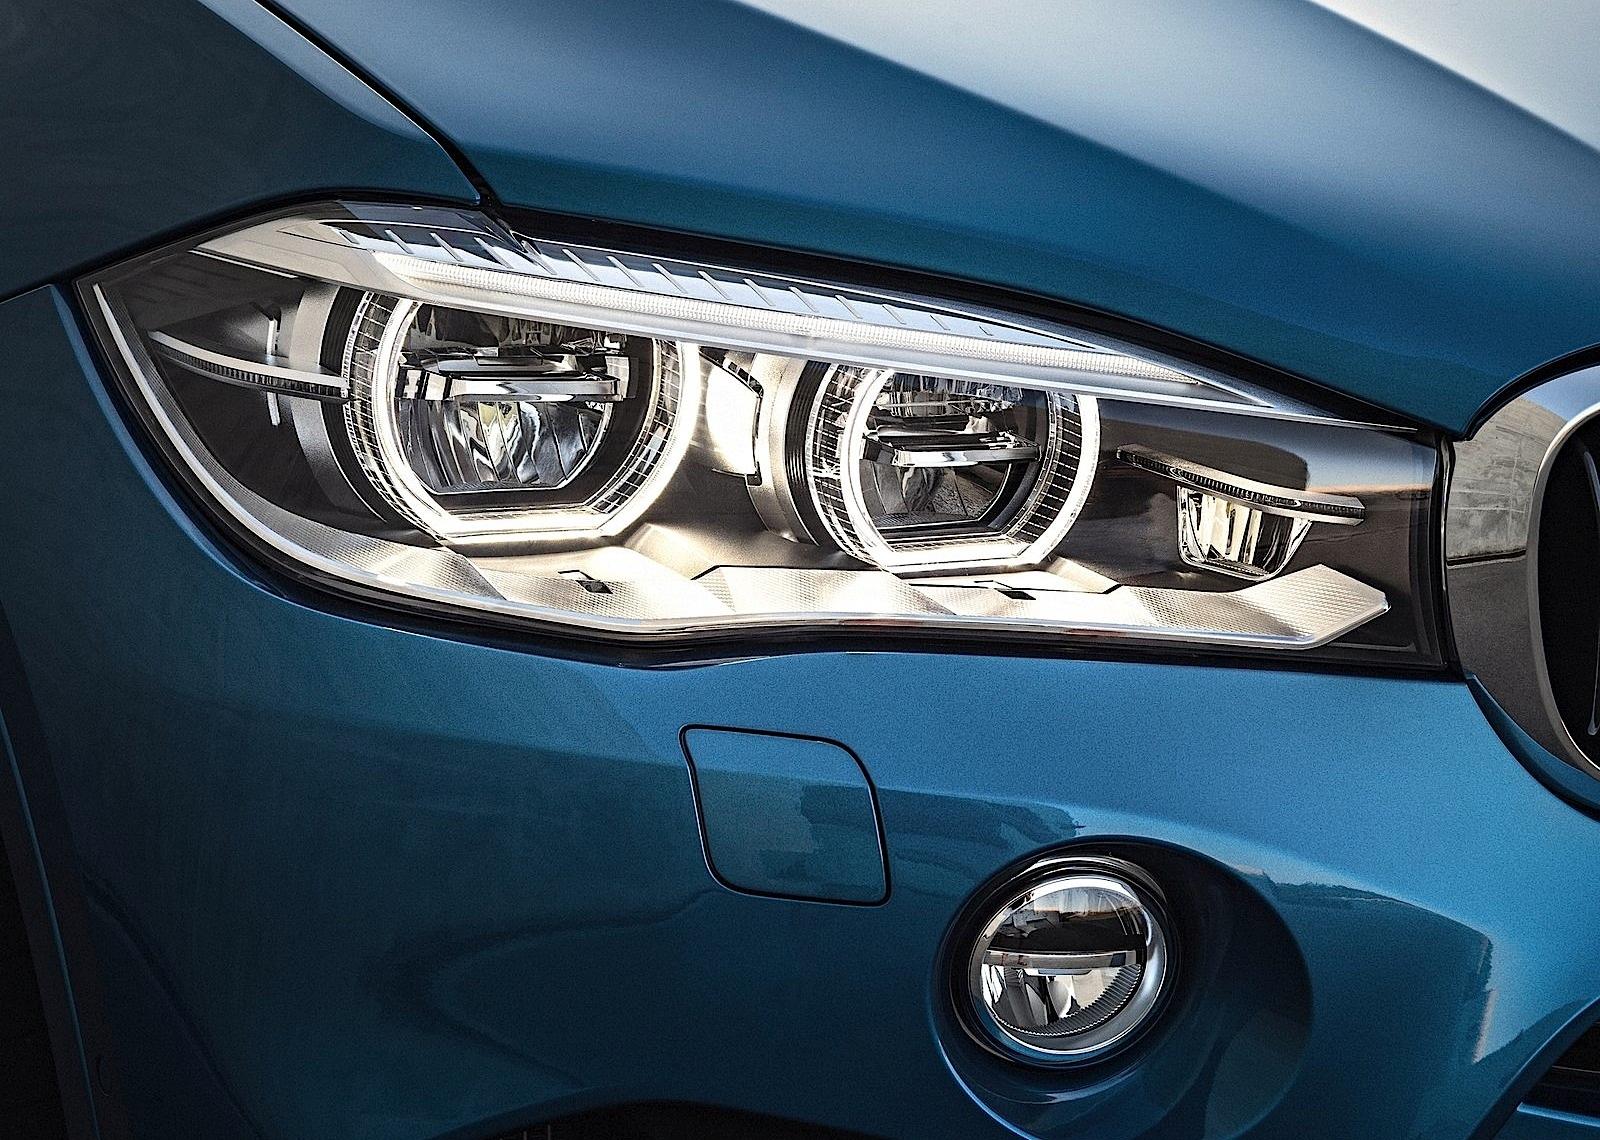 BMW X6M specs & photos - 2014, 2015, 2016, 2017, 2018 ...